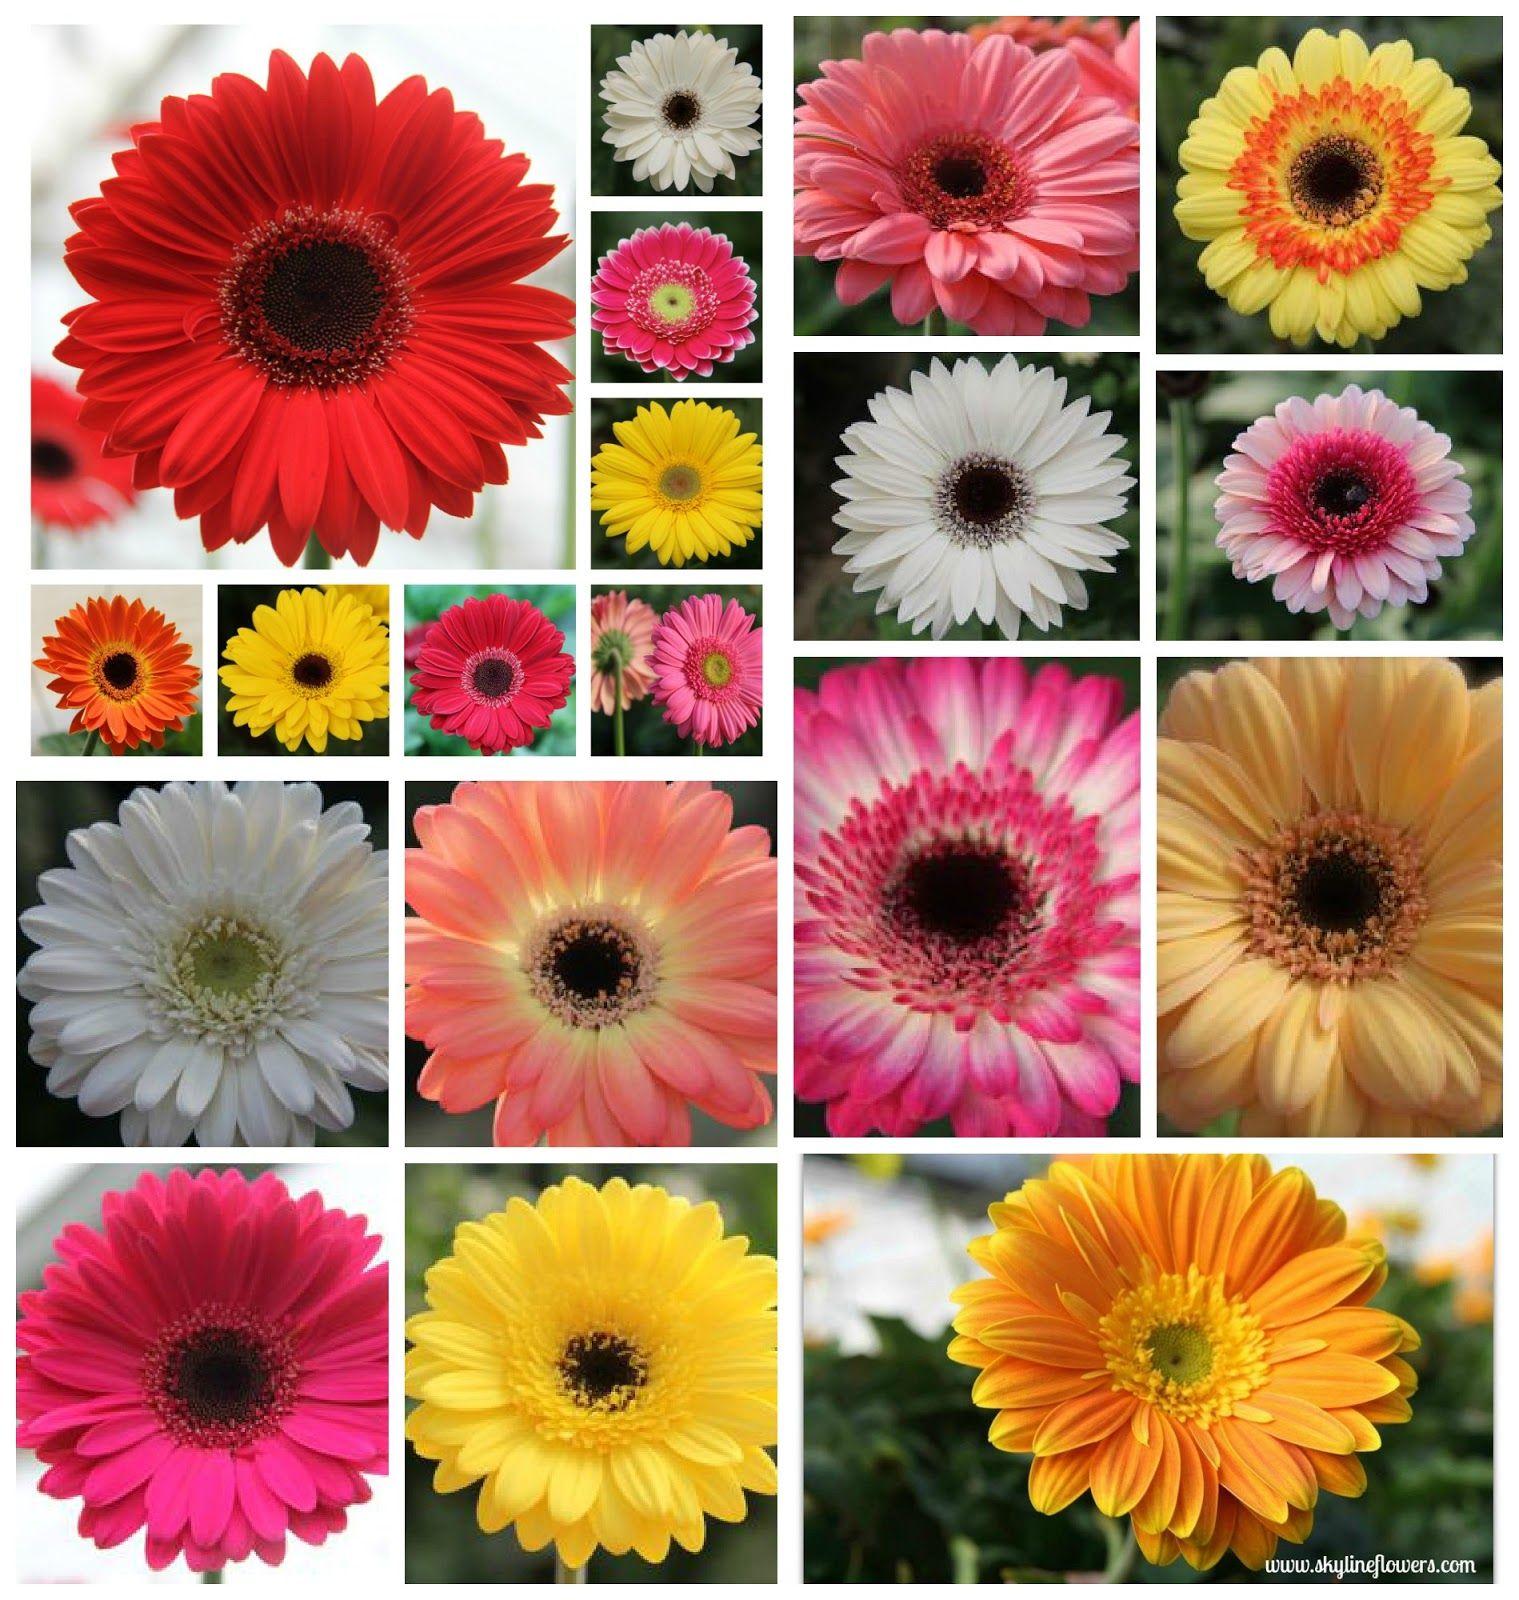 Sri Lanka Fresh Flowers From Nuwara Eliya Fresh Flowers Flowers Paper Flowers